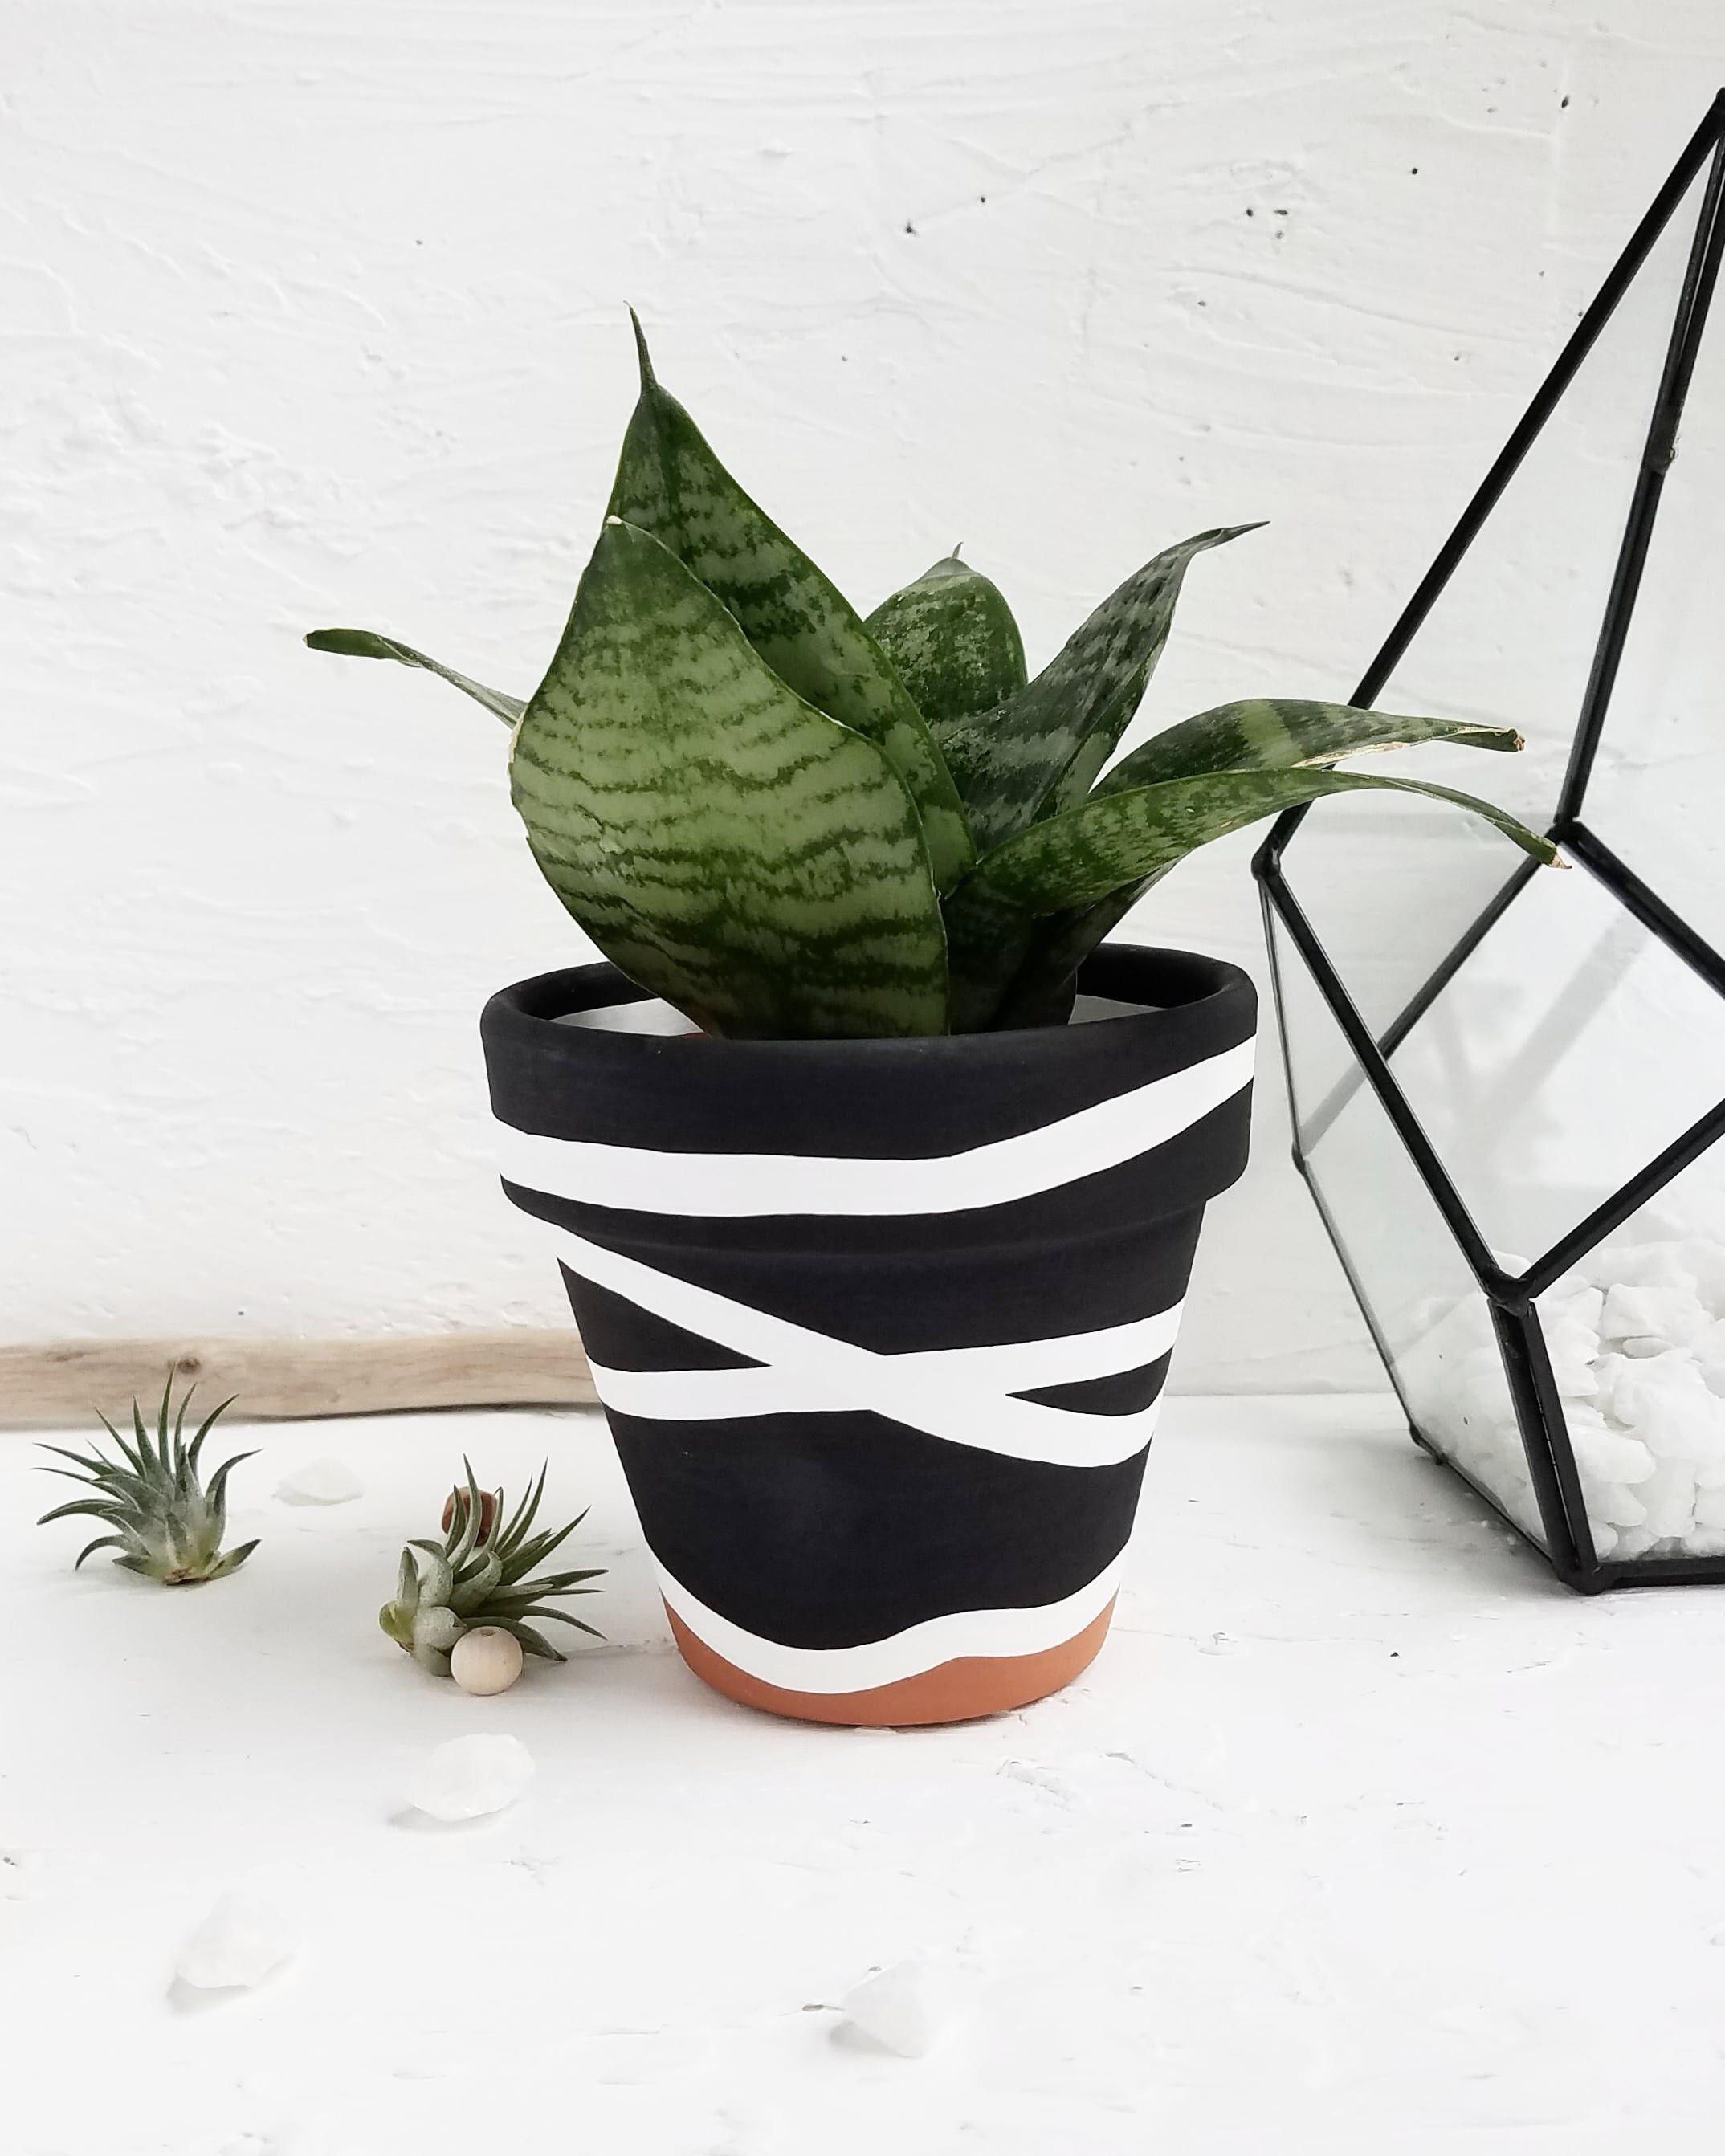 Planter Plantlovers Charitypot Charityplanter Blackandwhite Theinnocenceproject Innocenc In 2020 Painted Plant Pots Painted Terra Cotta Pots Painted Flower Pots